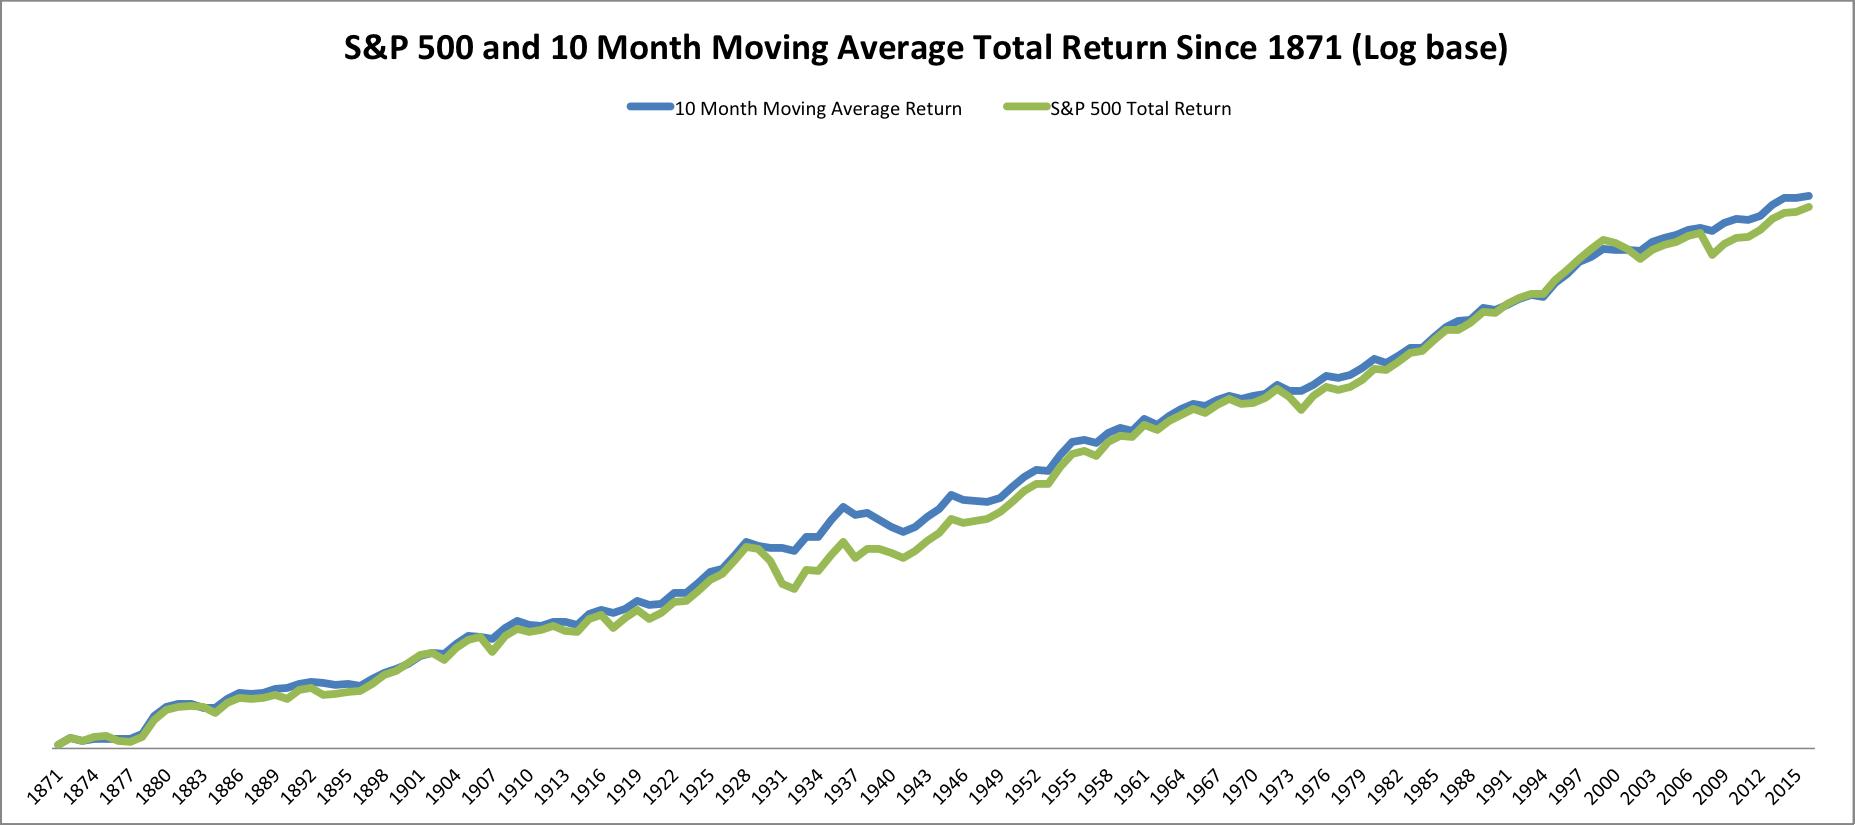 April 24, 2017: The Long Term Stock Market Timing Return Since 1871